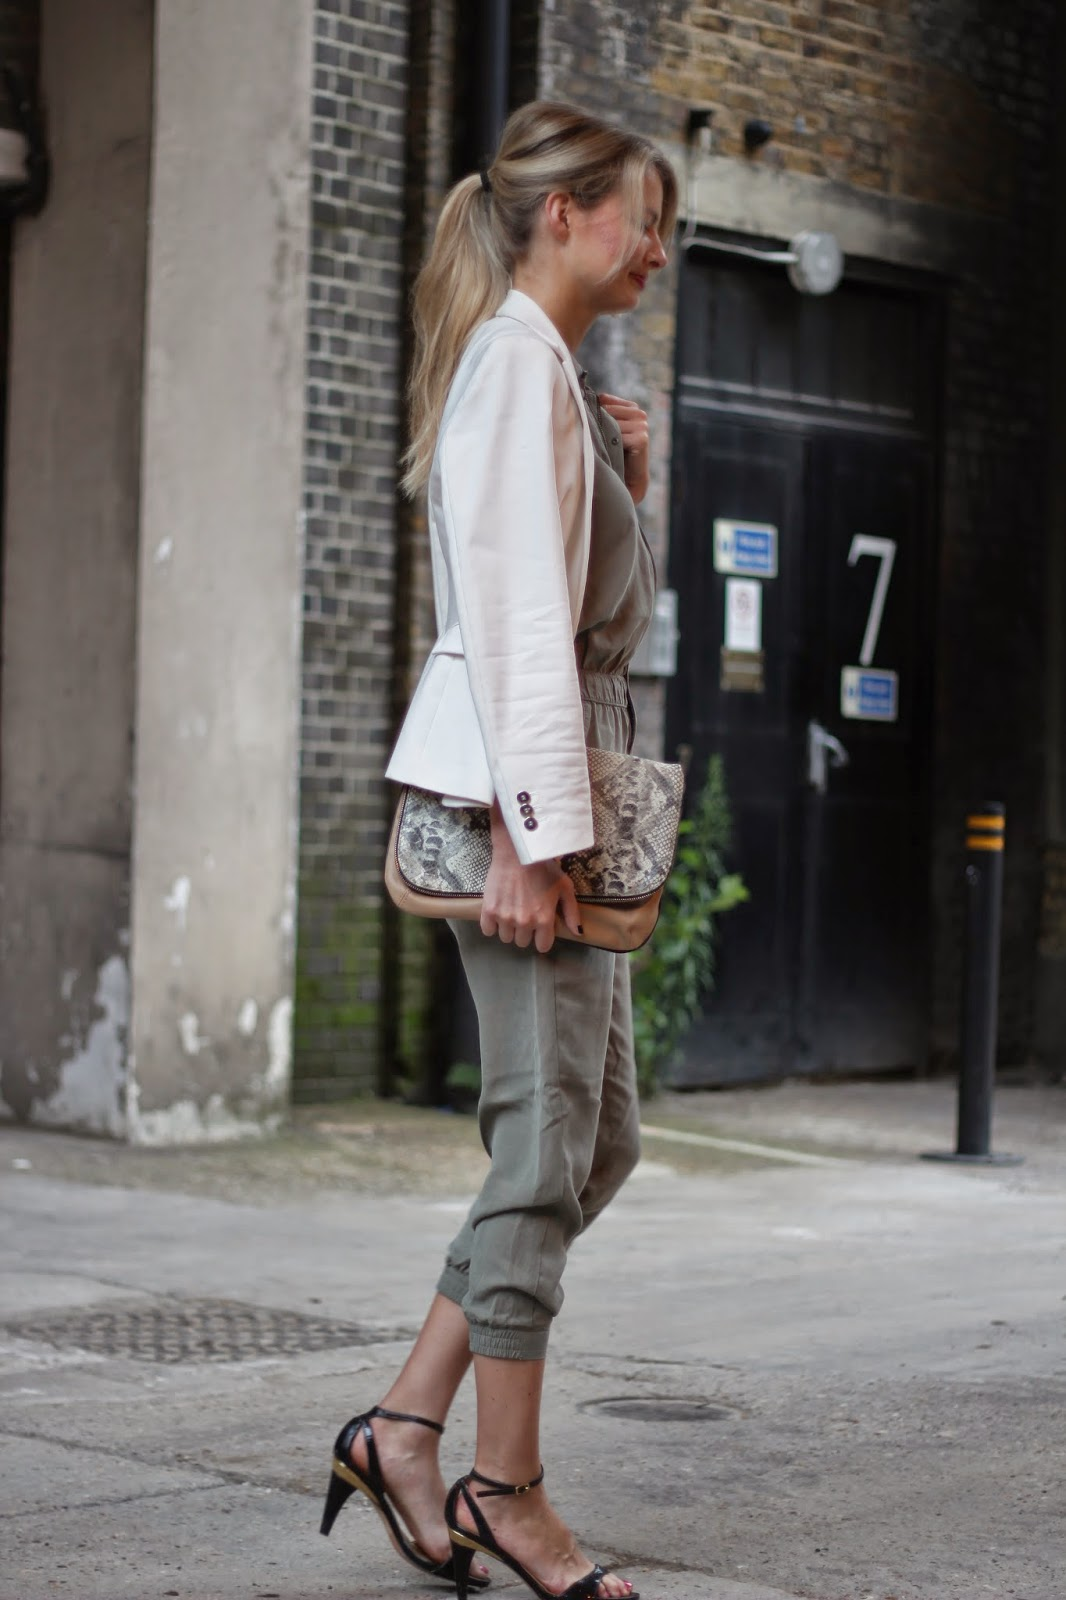 jumpsuit, boiler suit, street style, street style london, fashion blogger, white blazer, black sandals, snake print clutch, oversize clutch, zara jumpsuit